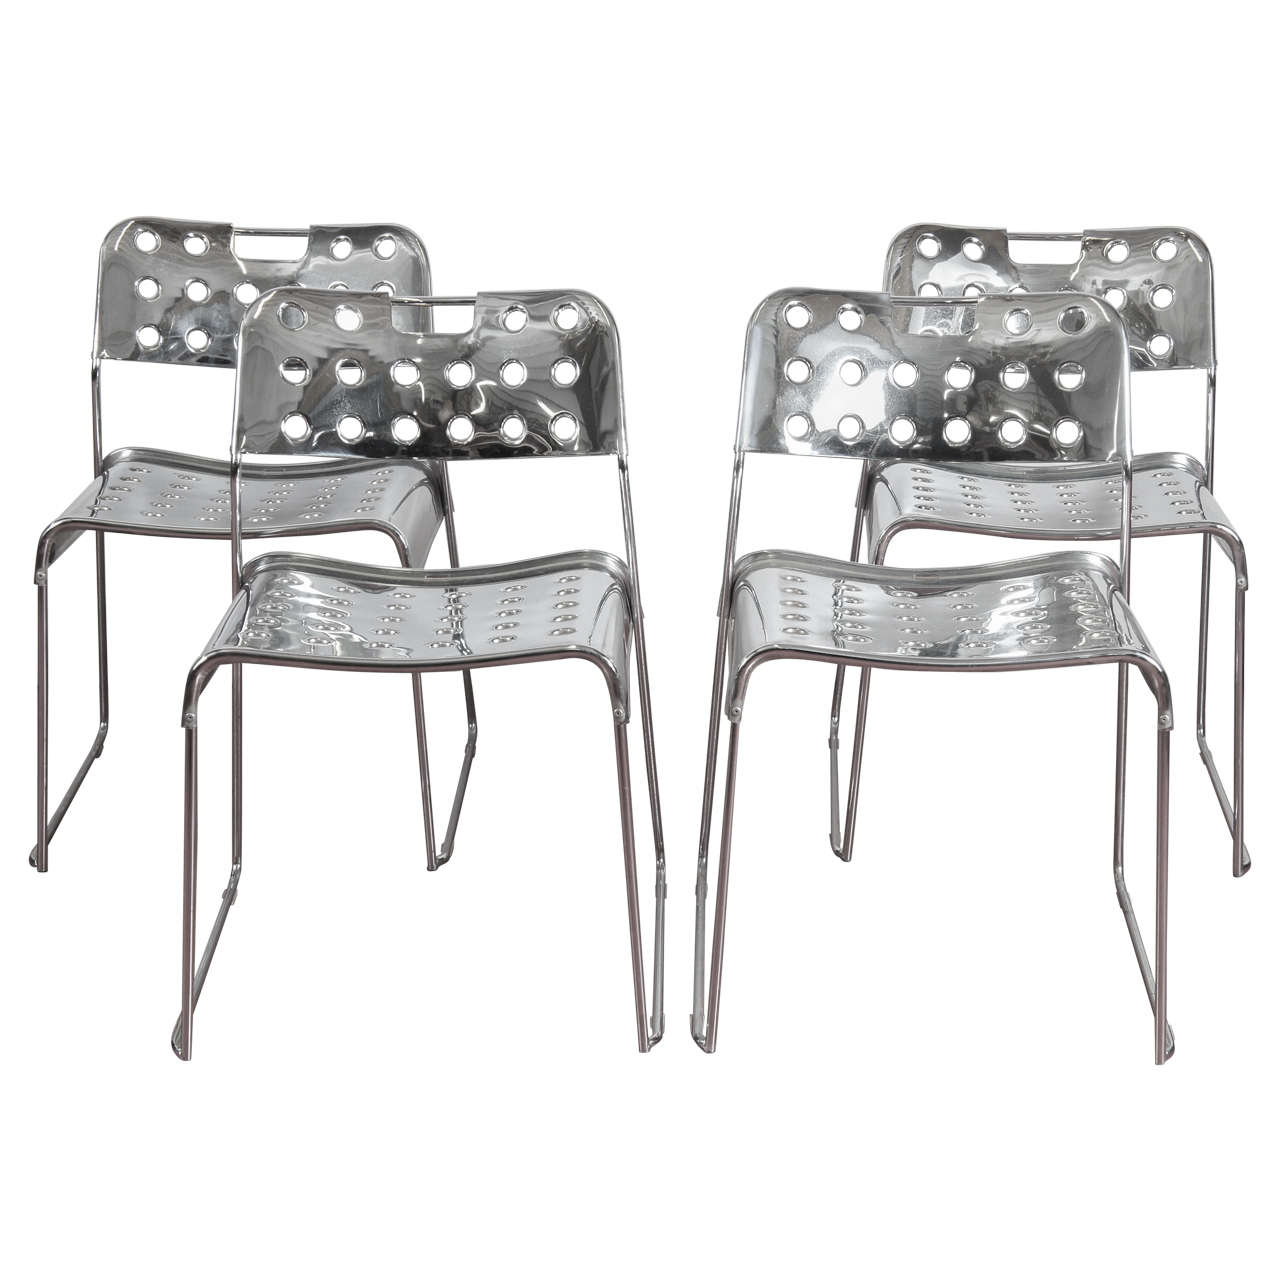 Rodney Kinsman Omkstak Chairs For Sale